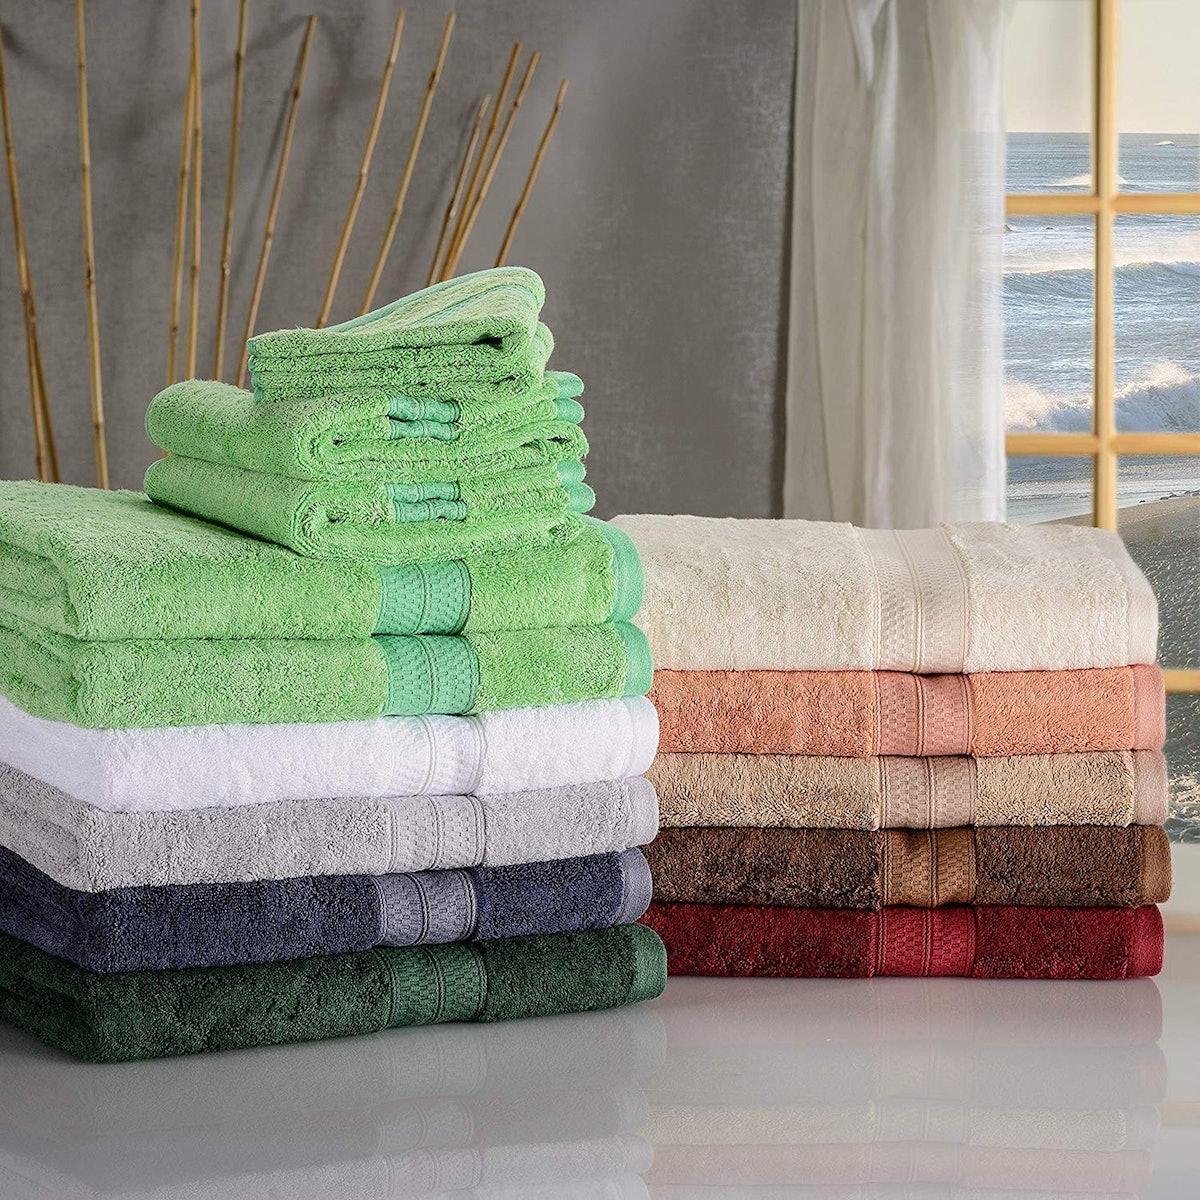 Superior Bathroom Towel Set